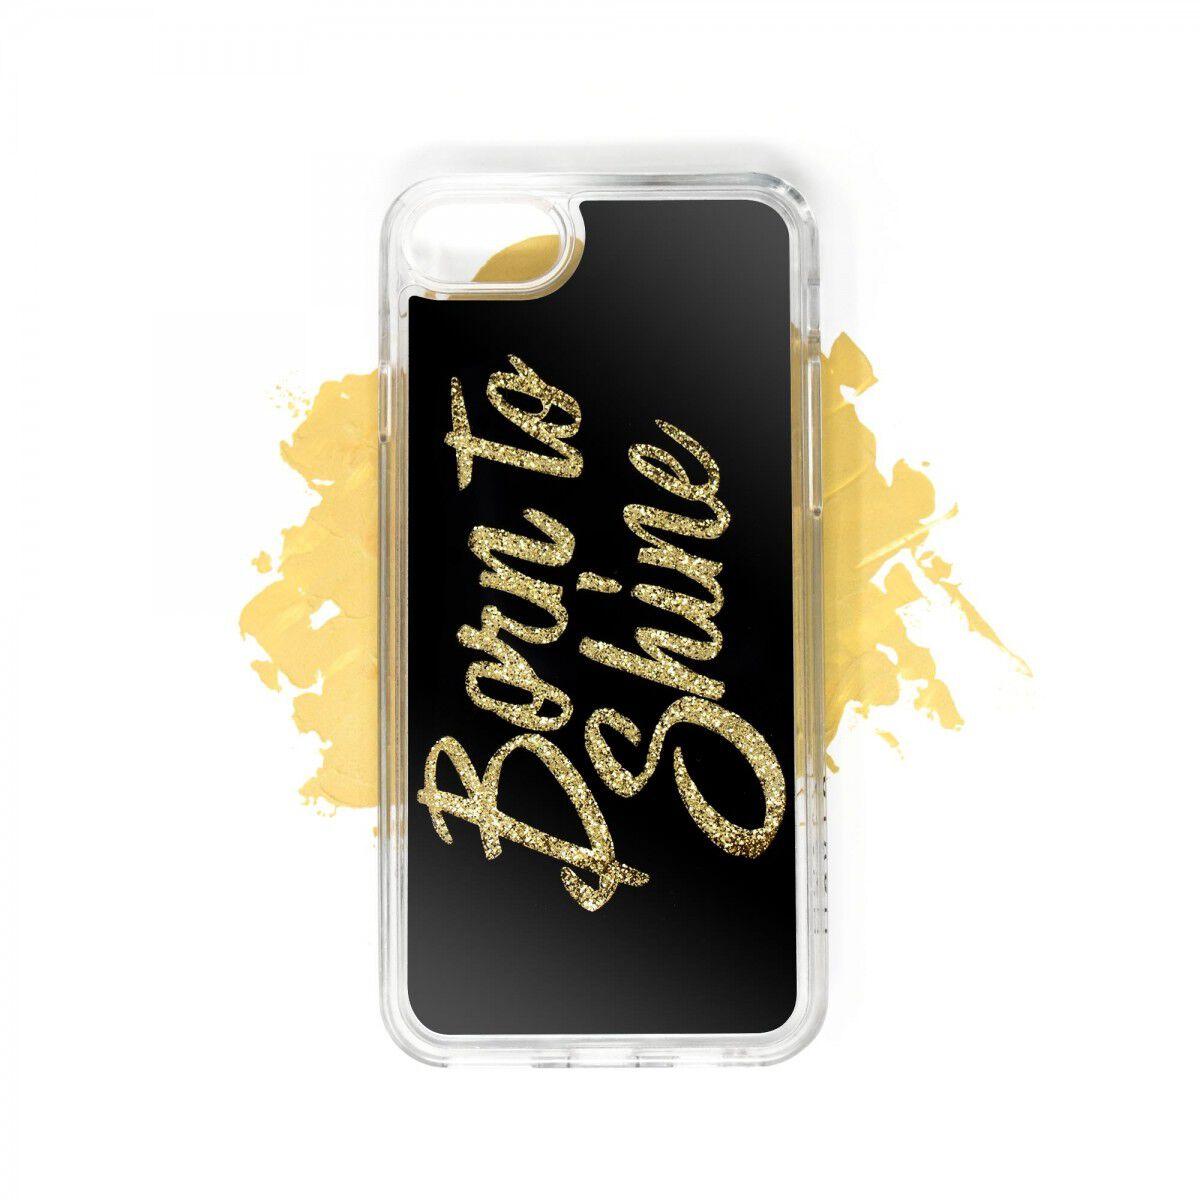 Born to Shine Liquid Glitter Case (Gold) for Apple iPhone 8, 7, 6s, 6